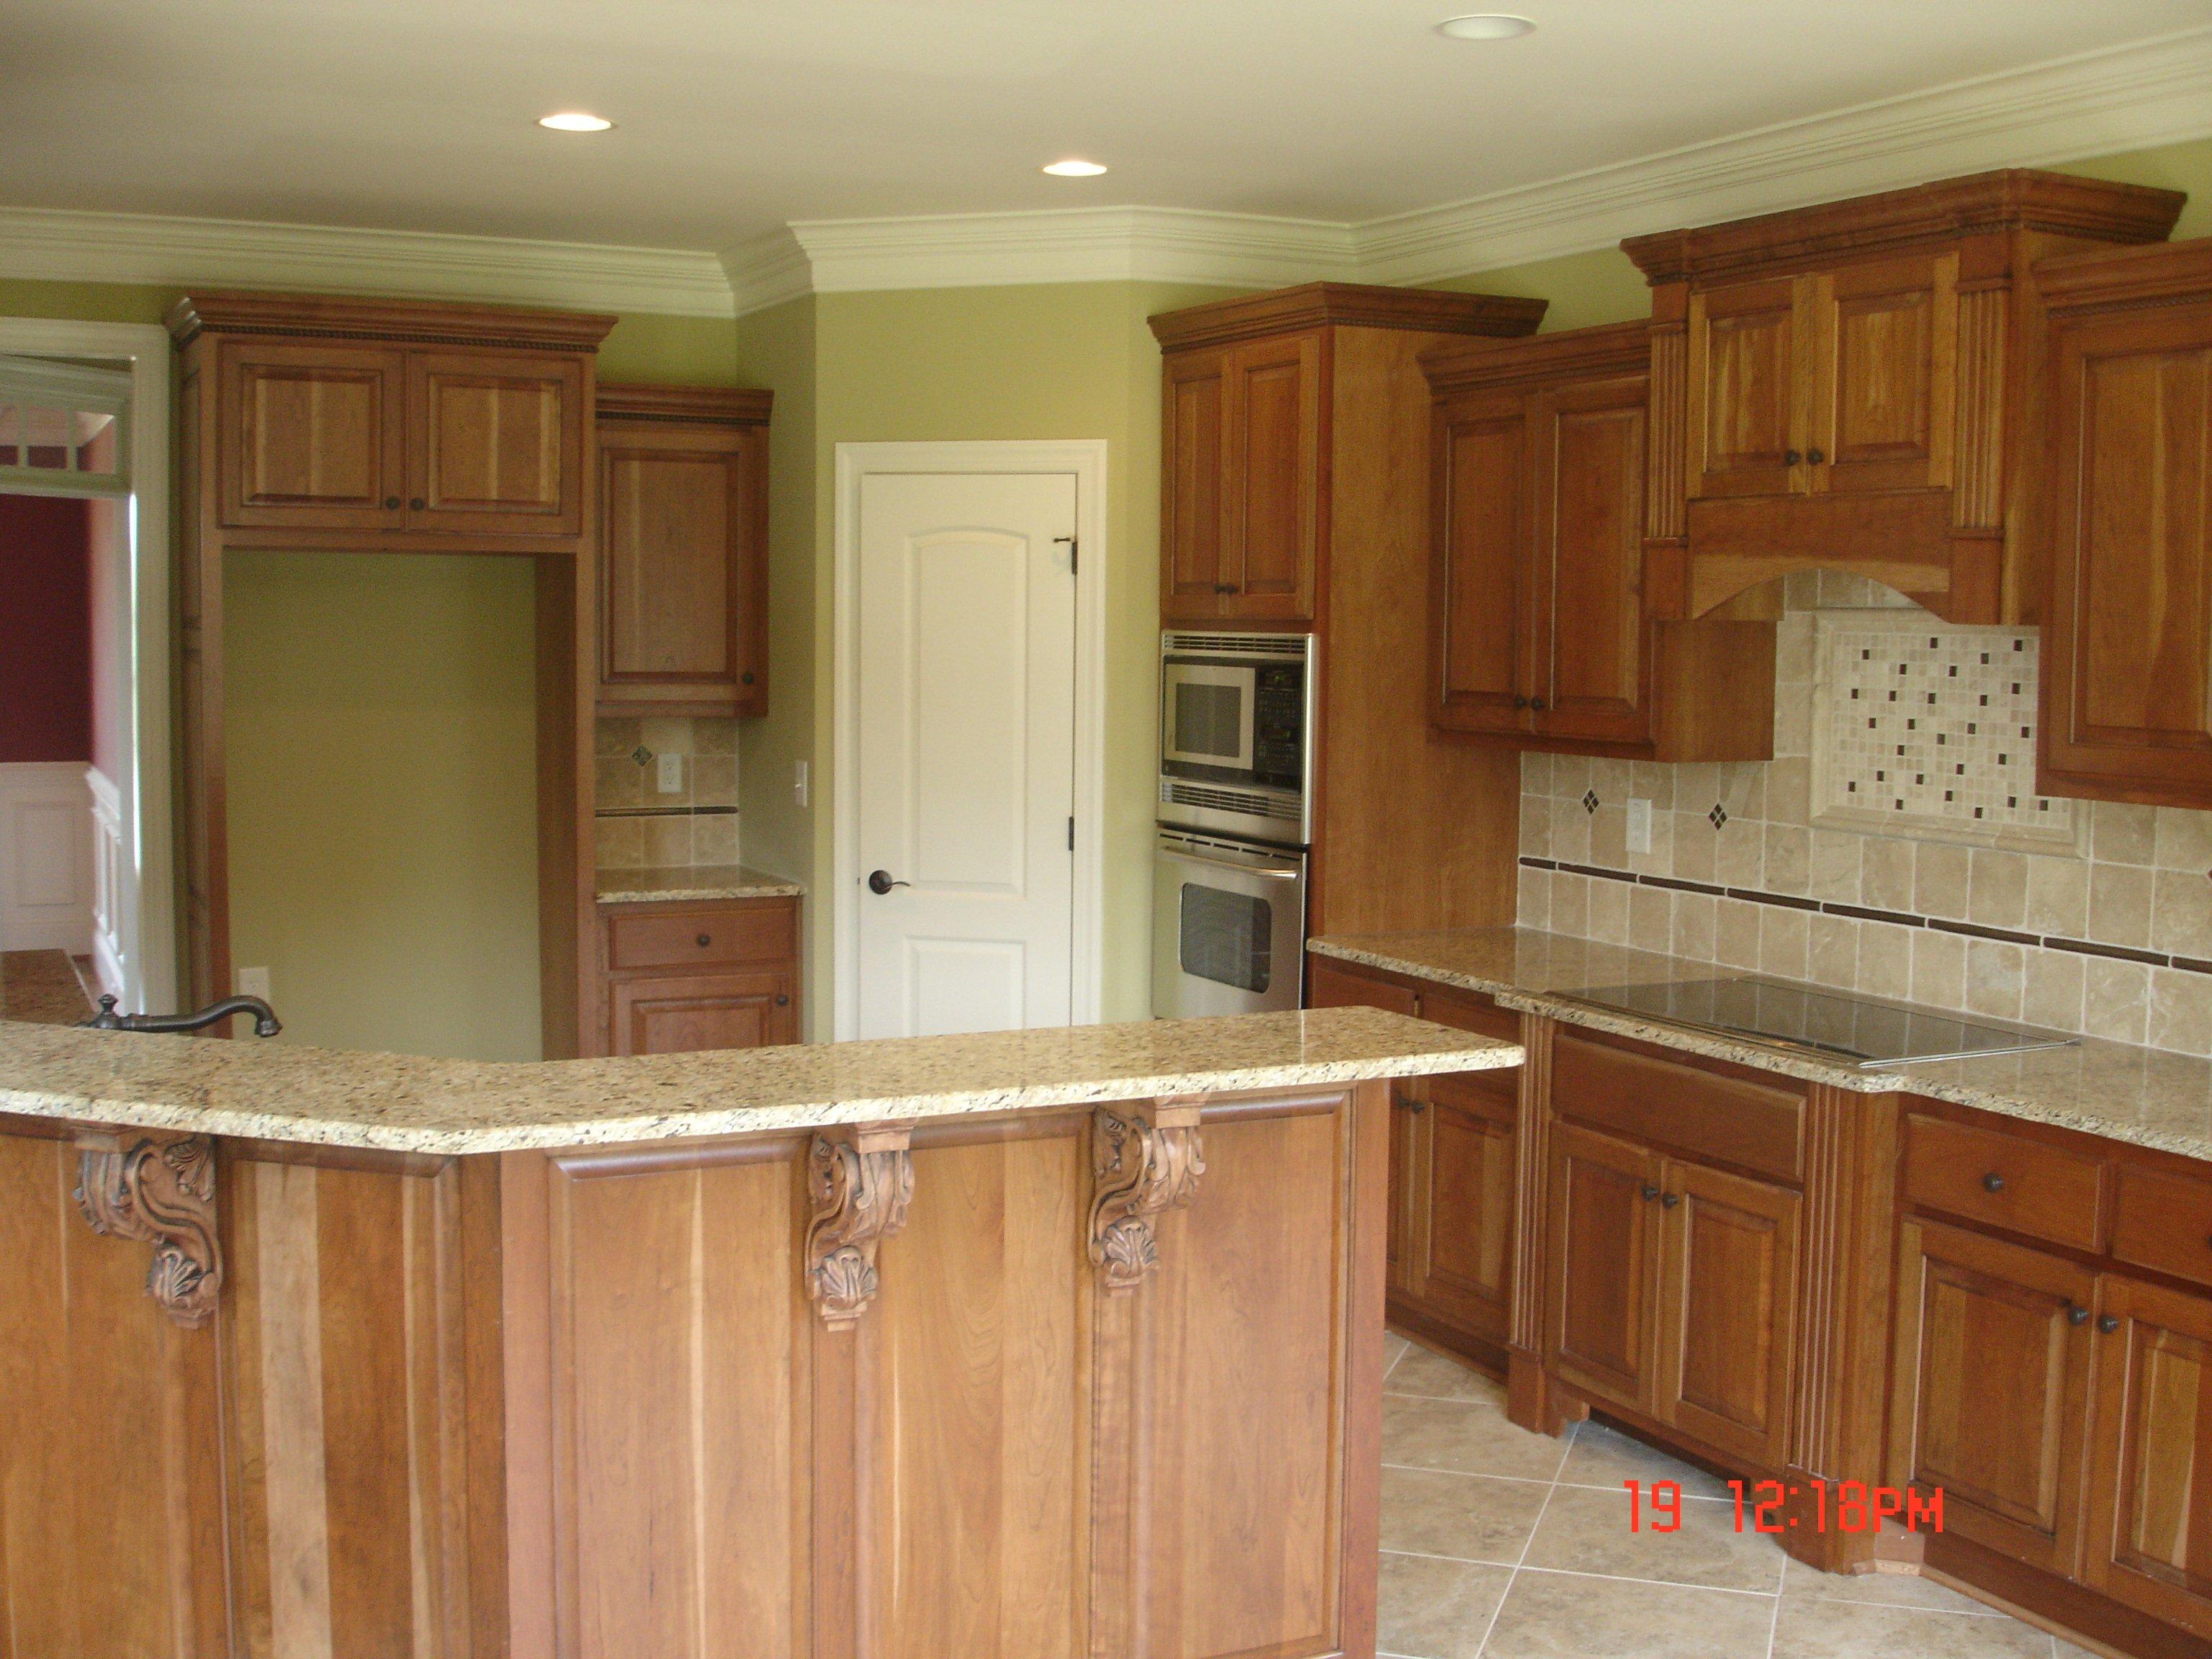 custom kitchen cabinets fayetteville nc cabinets matttroy